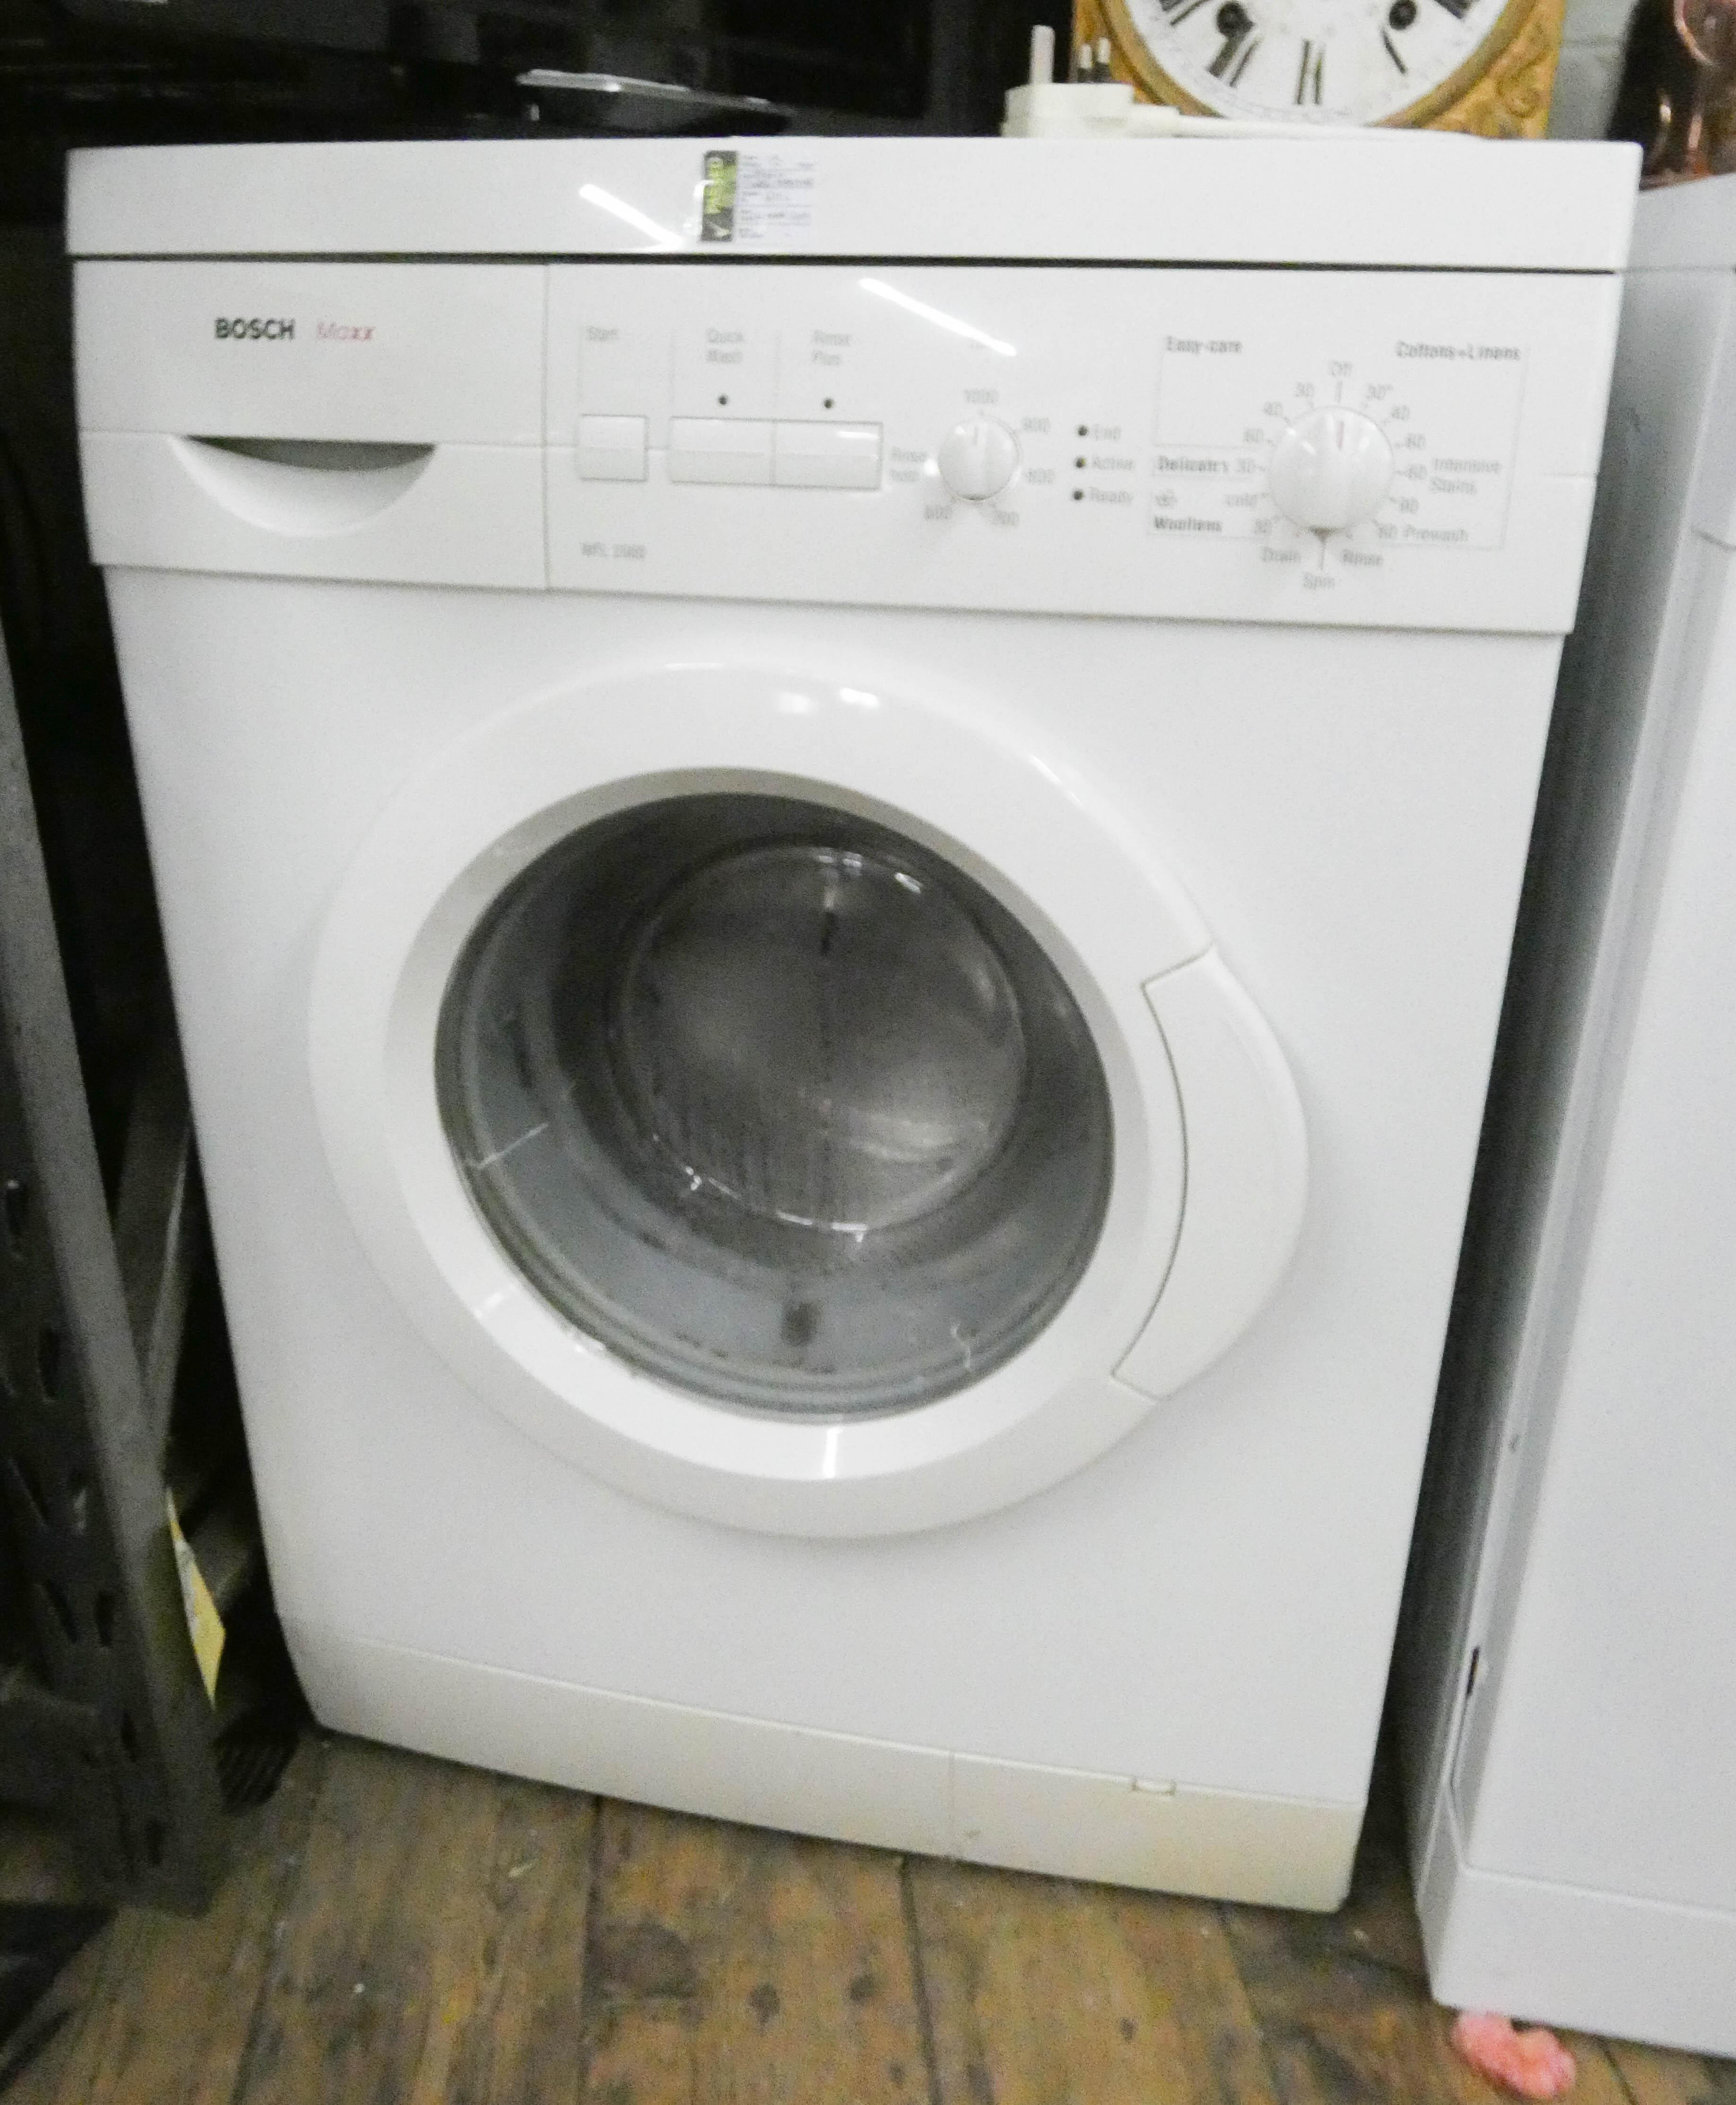 Lot 10 - A Bosch Maxx washing machine